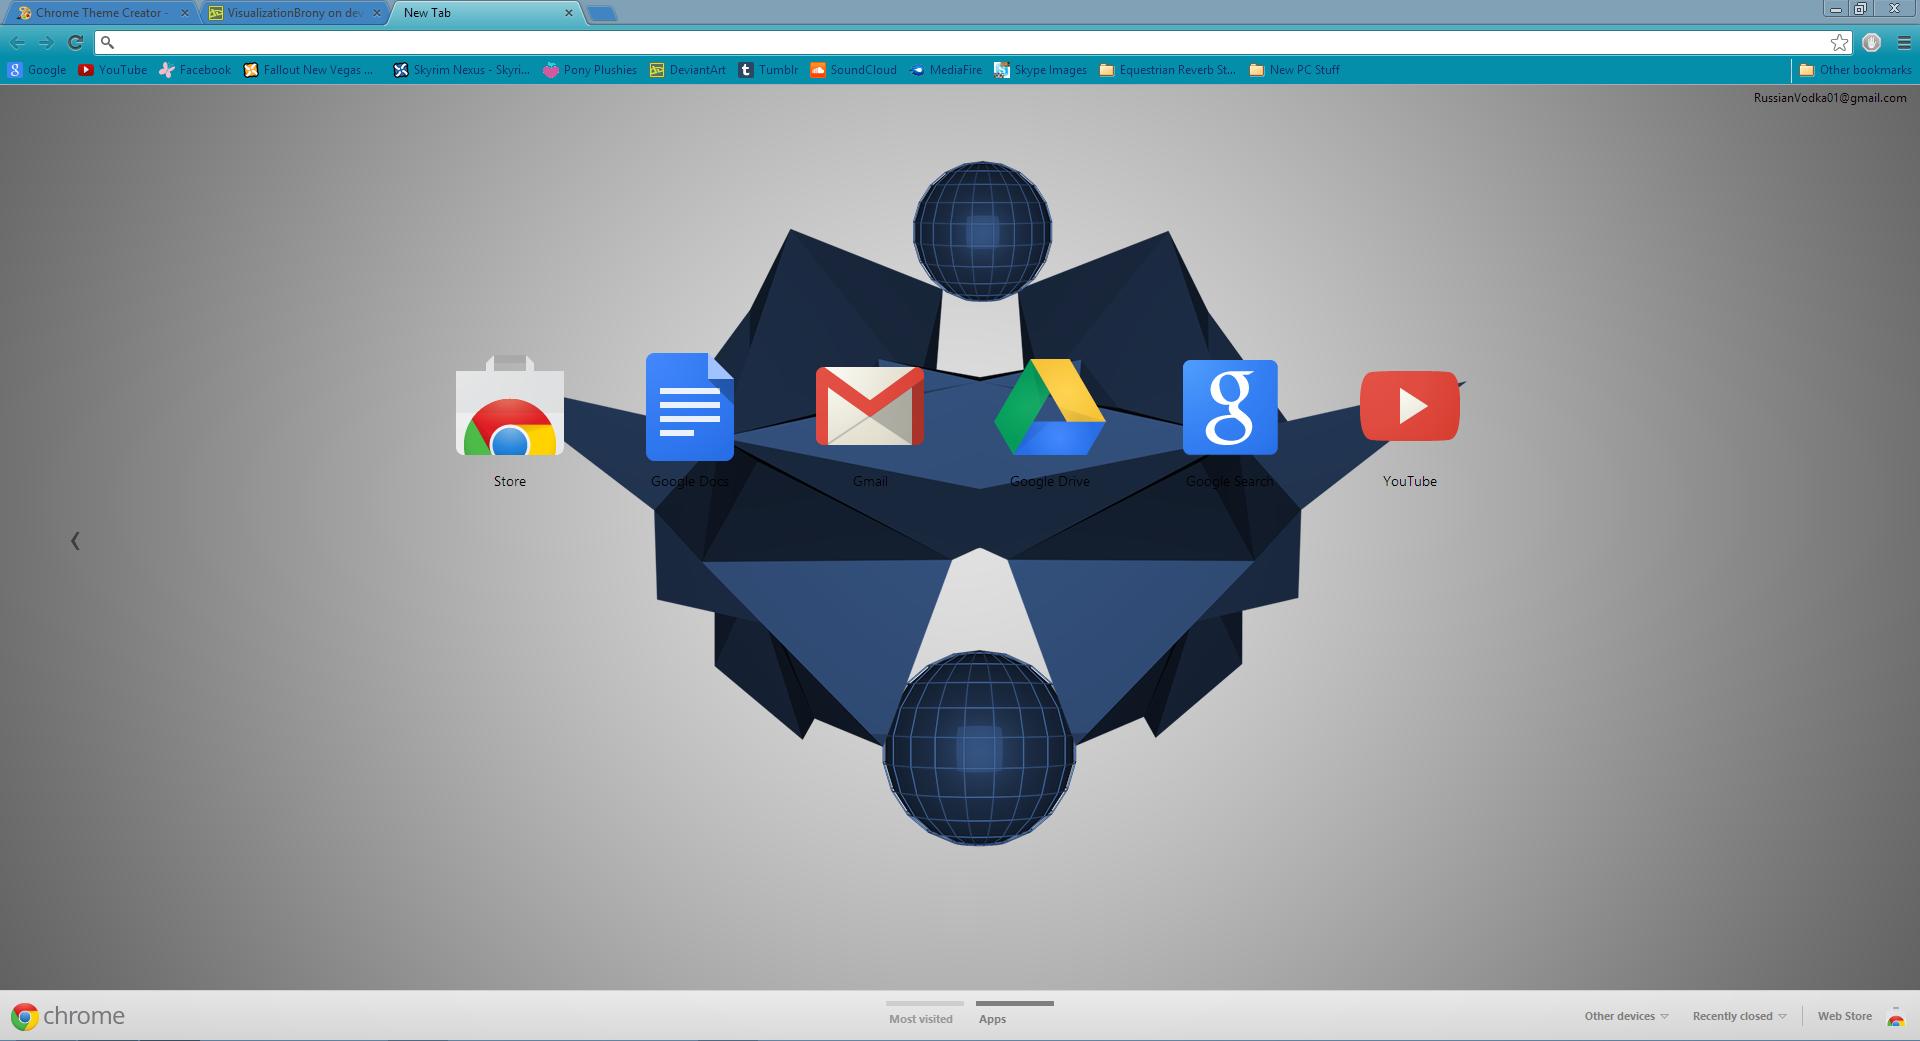 Gmail theme creator - Fractal Google Chrome Theme By Visualizationbrony Fractal Google Chrome Theme By Visualizationbrony